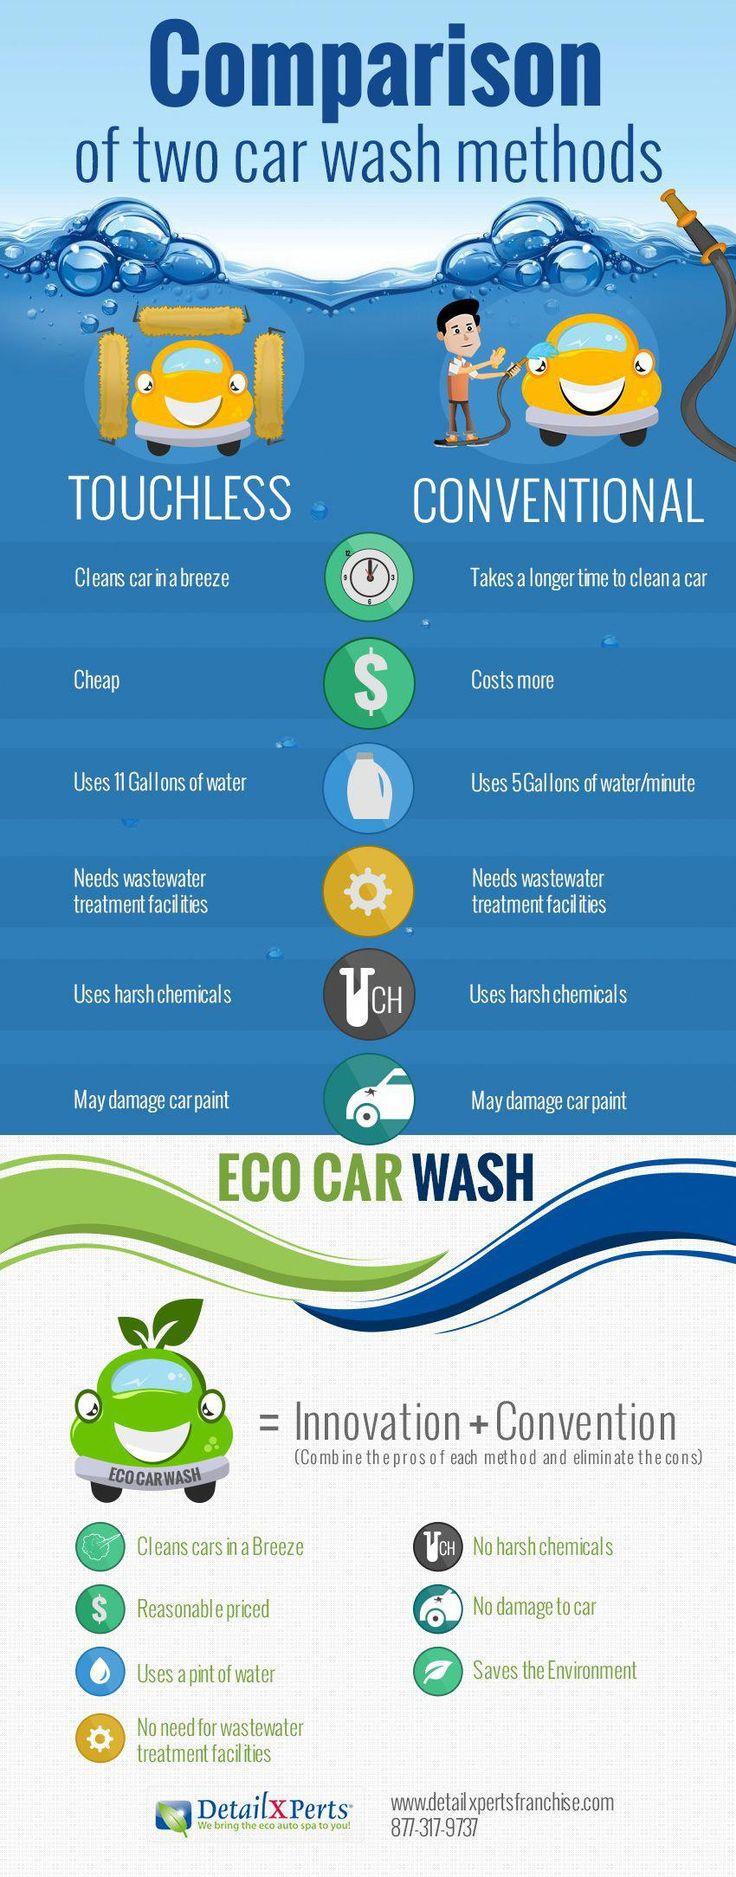 Eco Friendly Car Wash Innovation + Convention